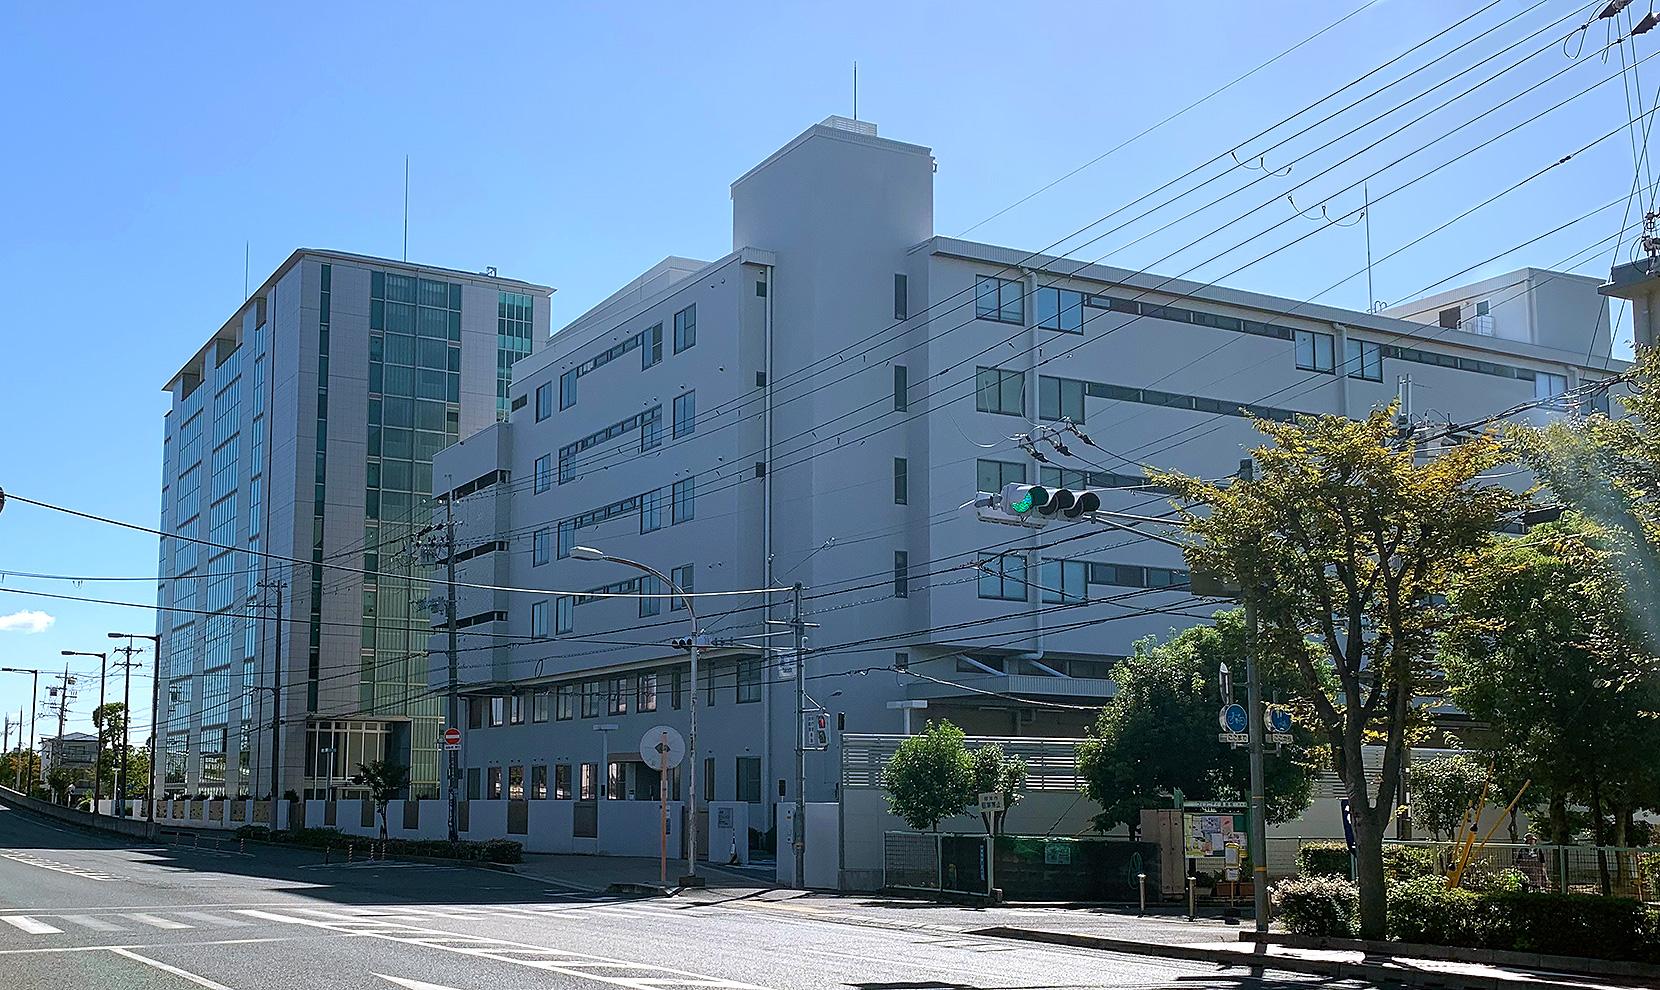 富士フイルム和光純薬株式会社 大阪工場